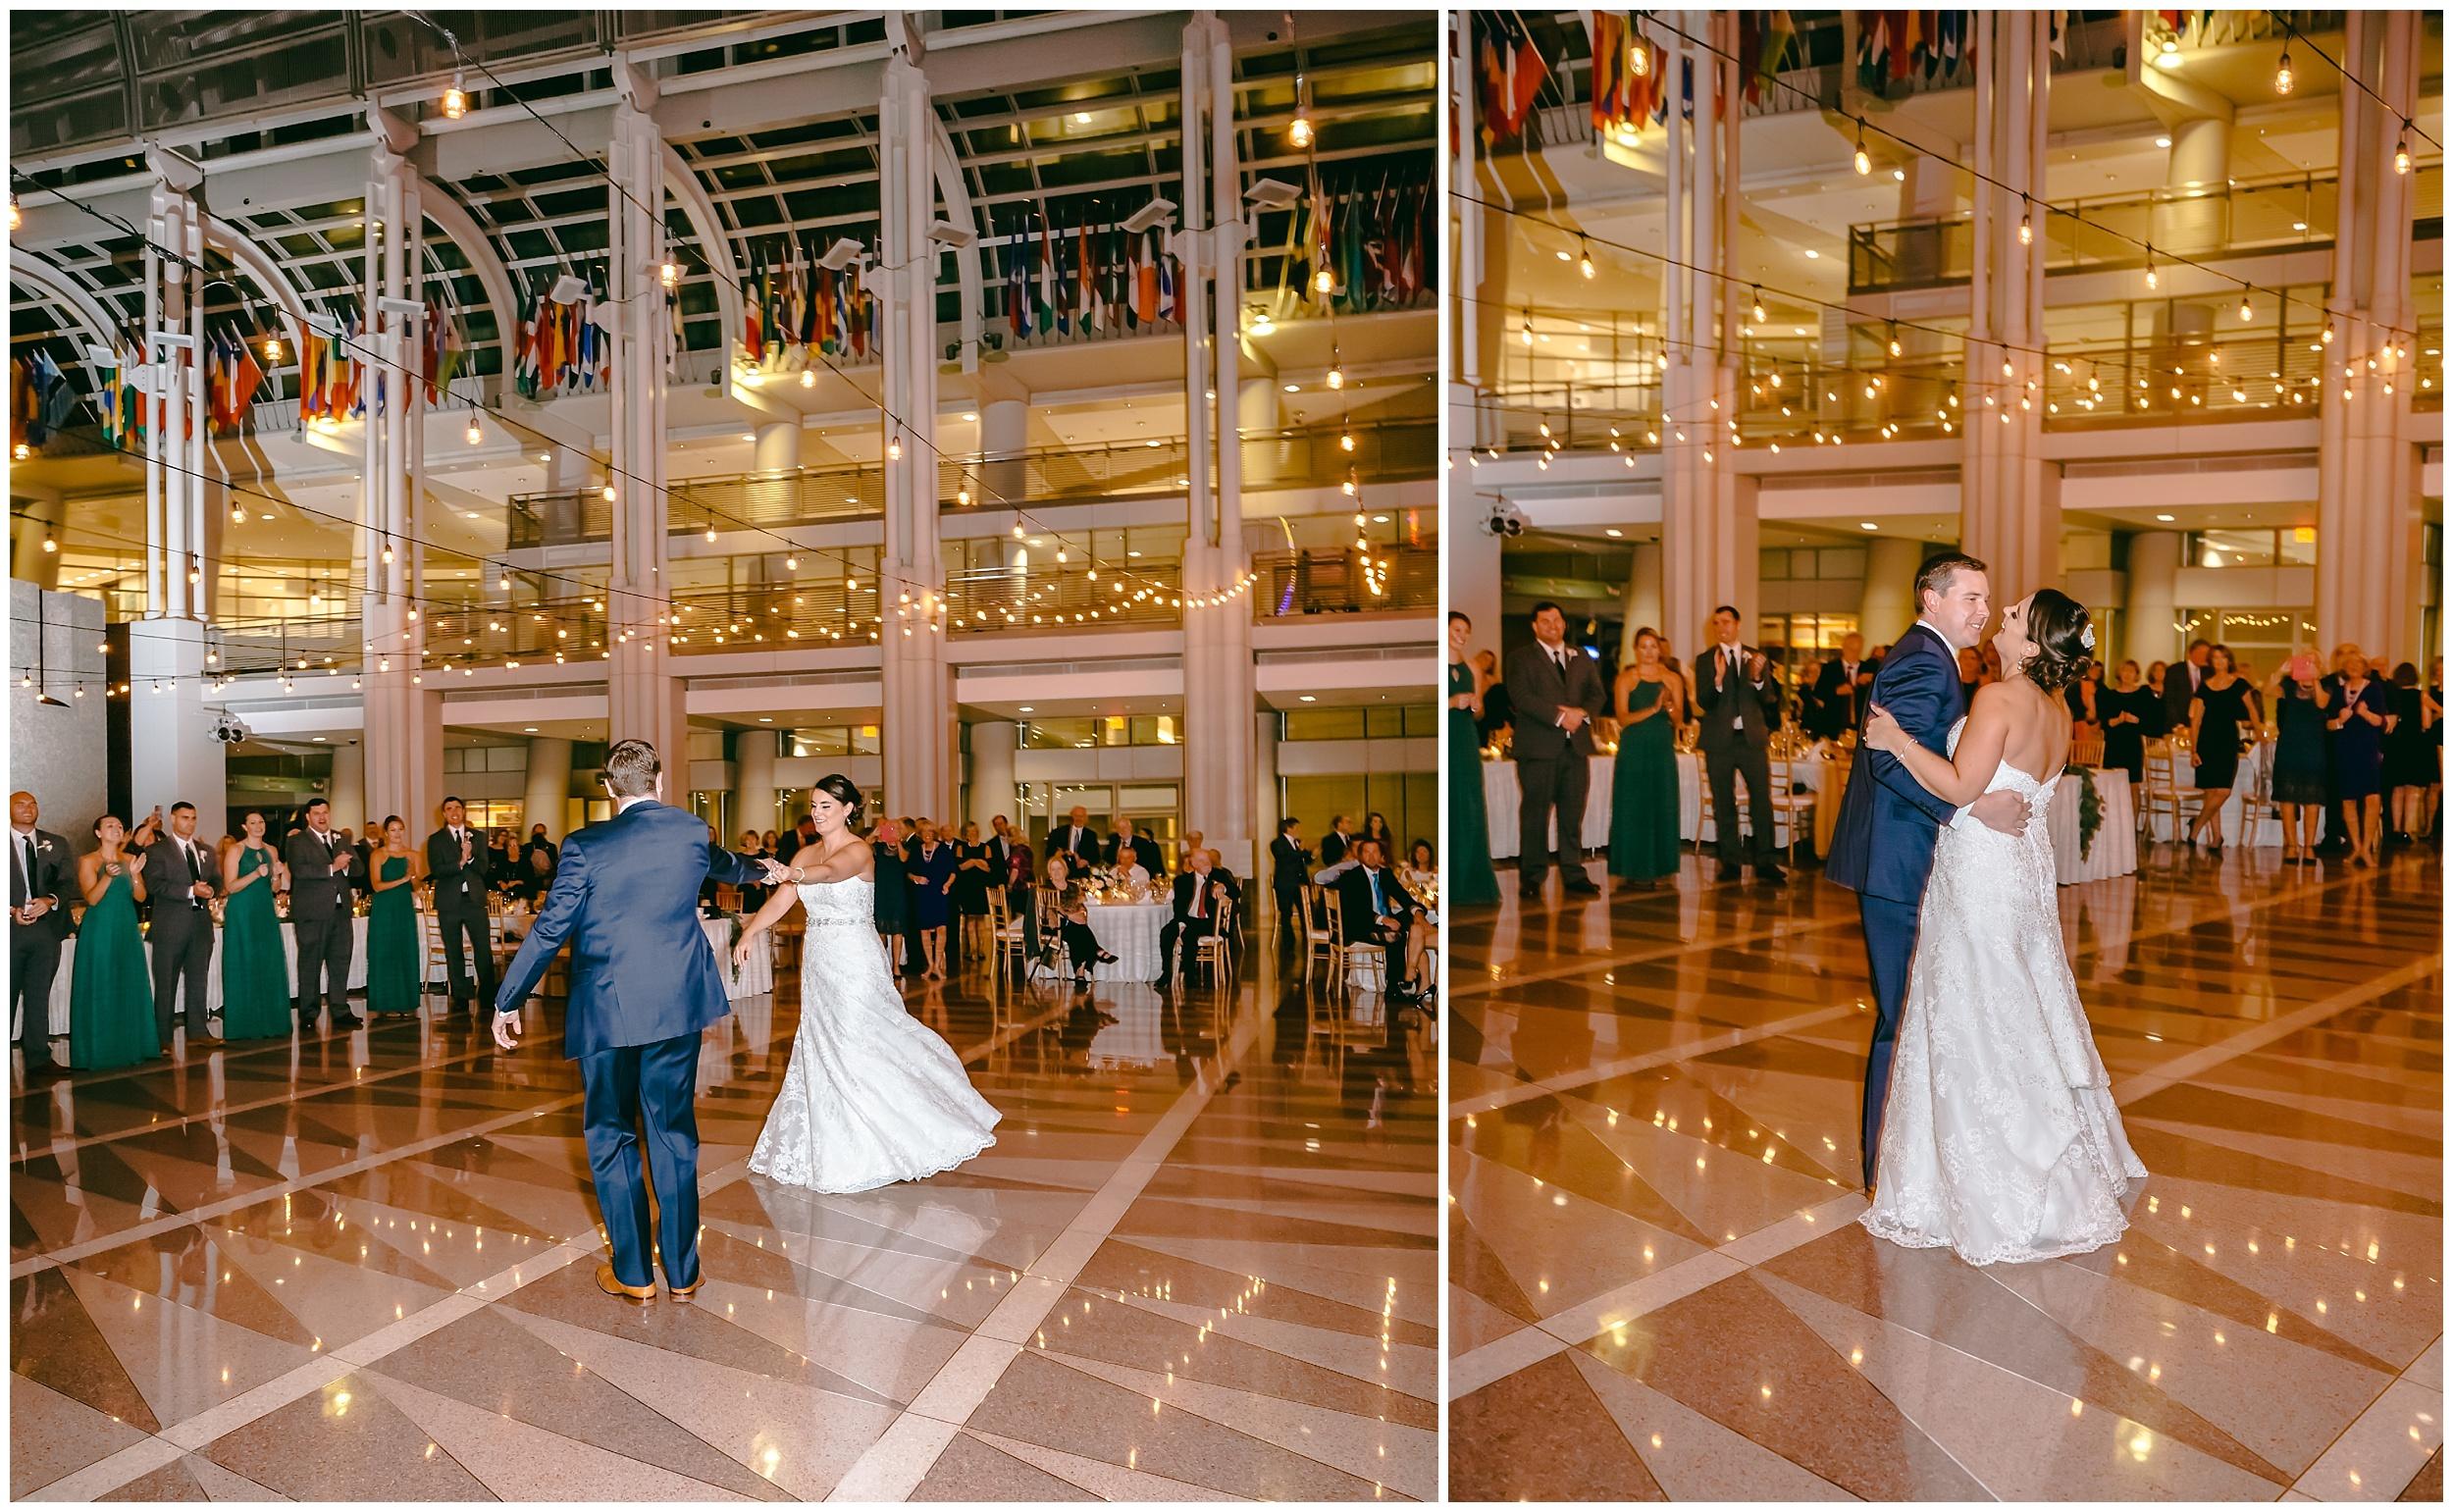 wedding-reception-bride-groom-entrance-first-dance-ronald-reagan-washington-dc-photographer